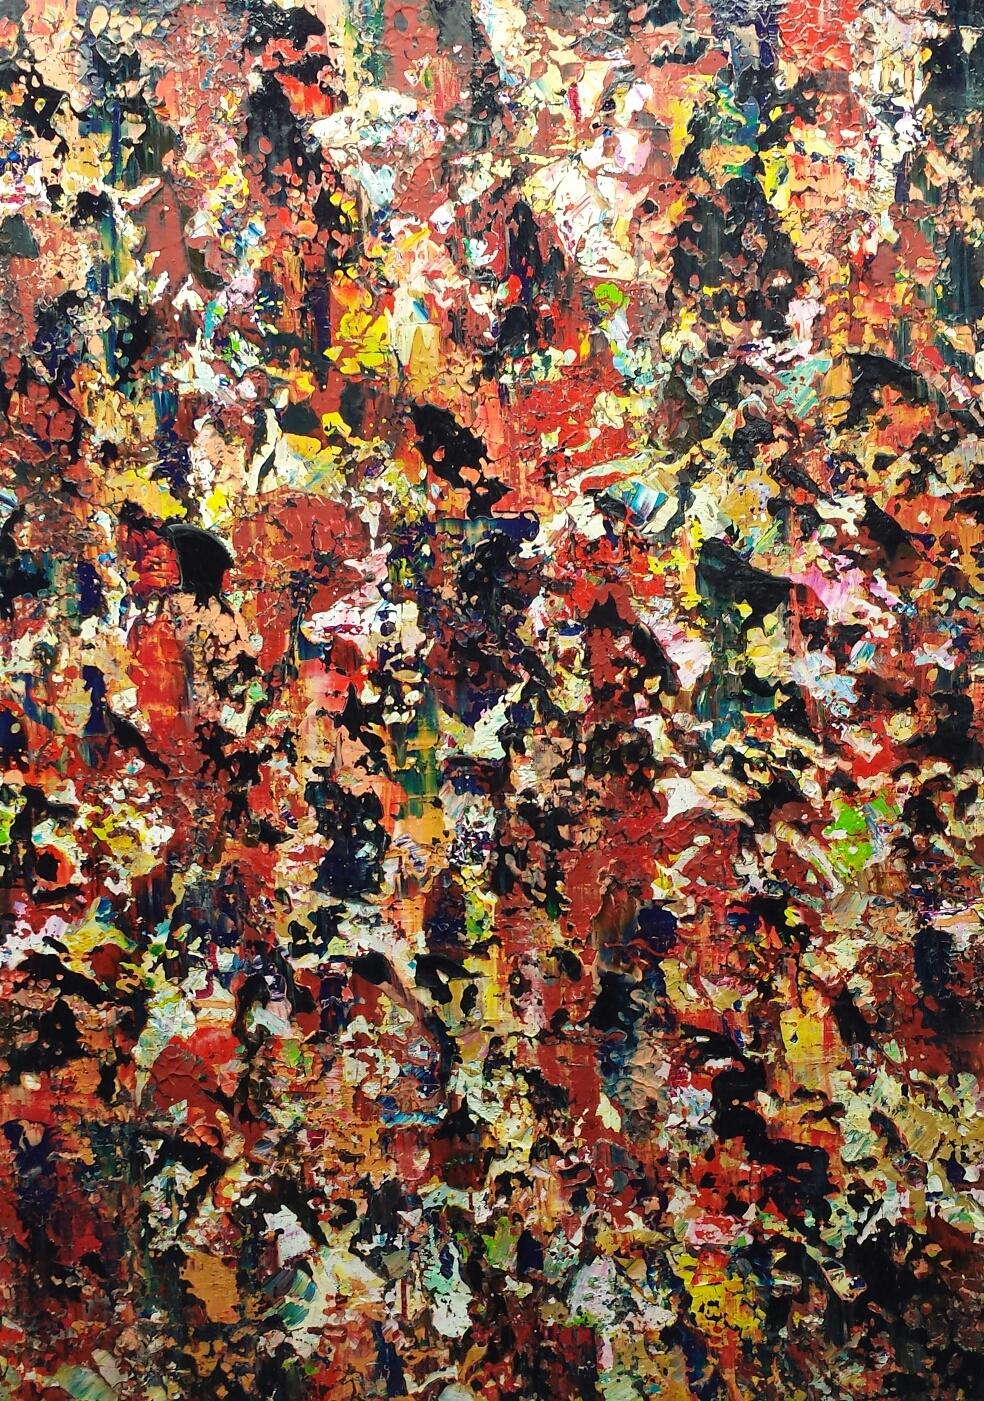 50x70 cm - sold